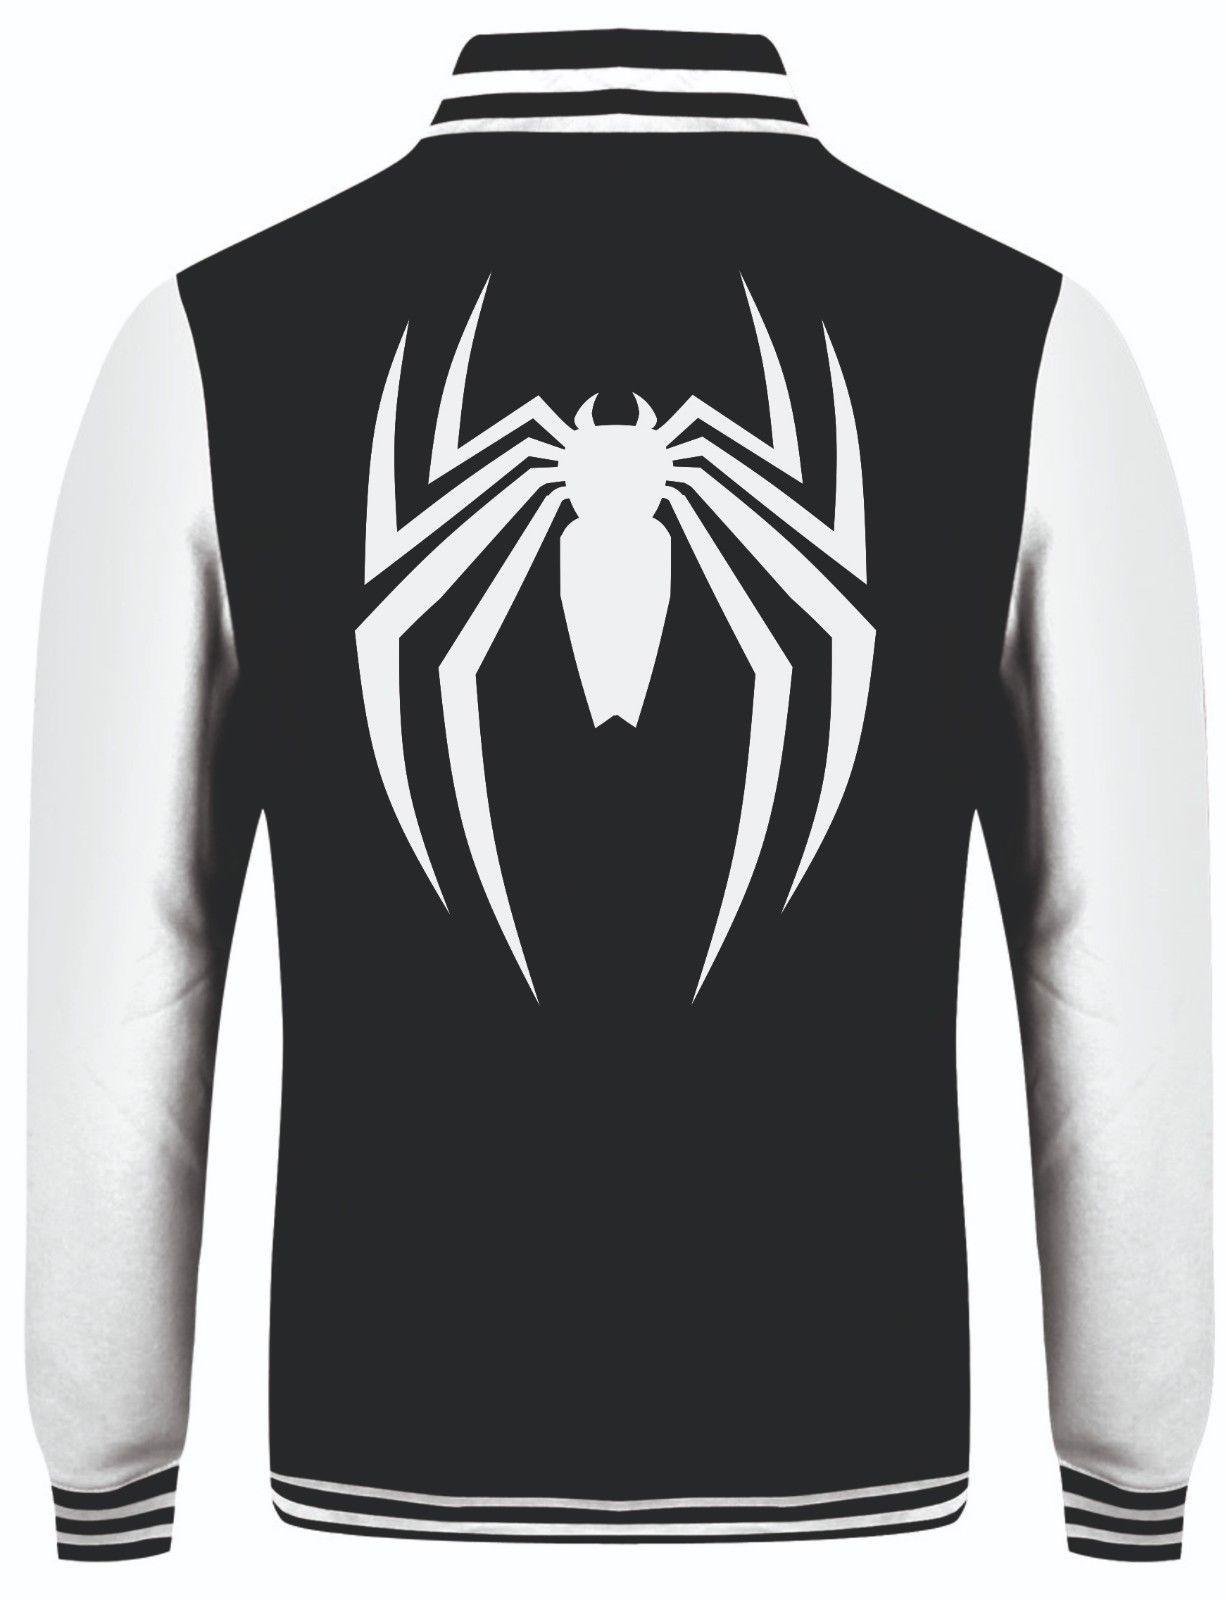 Spiderman Varsity Jacket Men's PS4 Top Superhero PlayStation